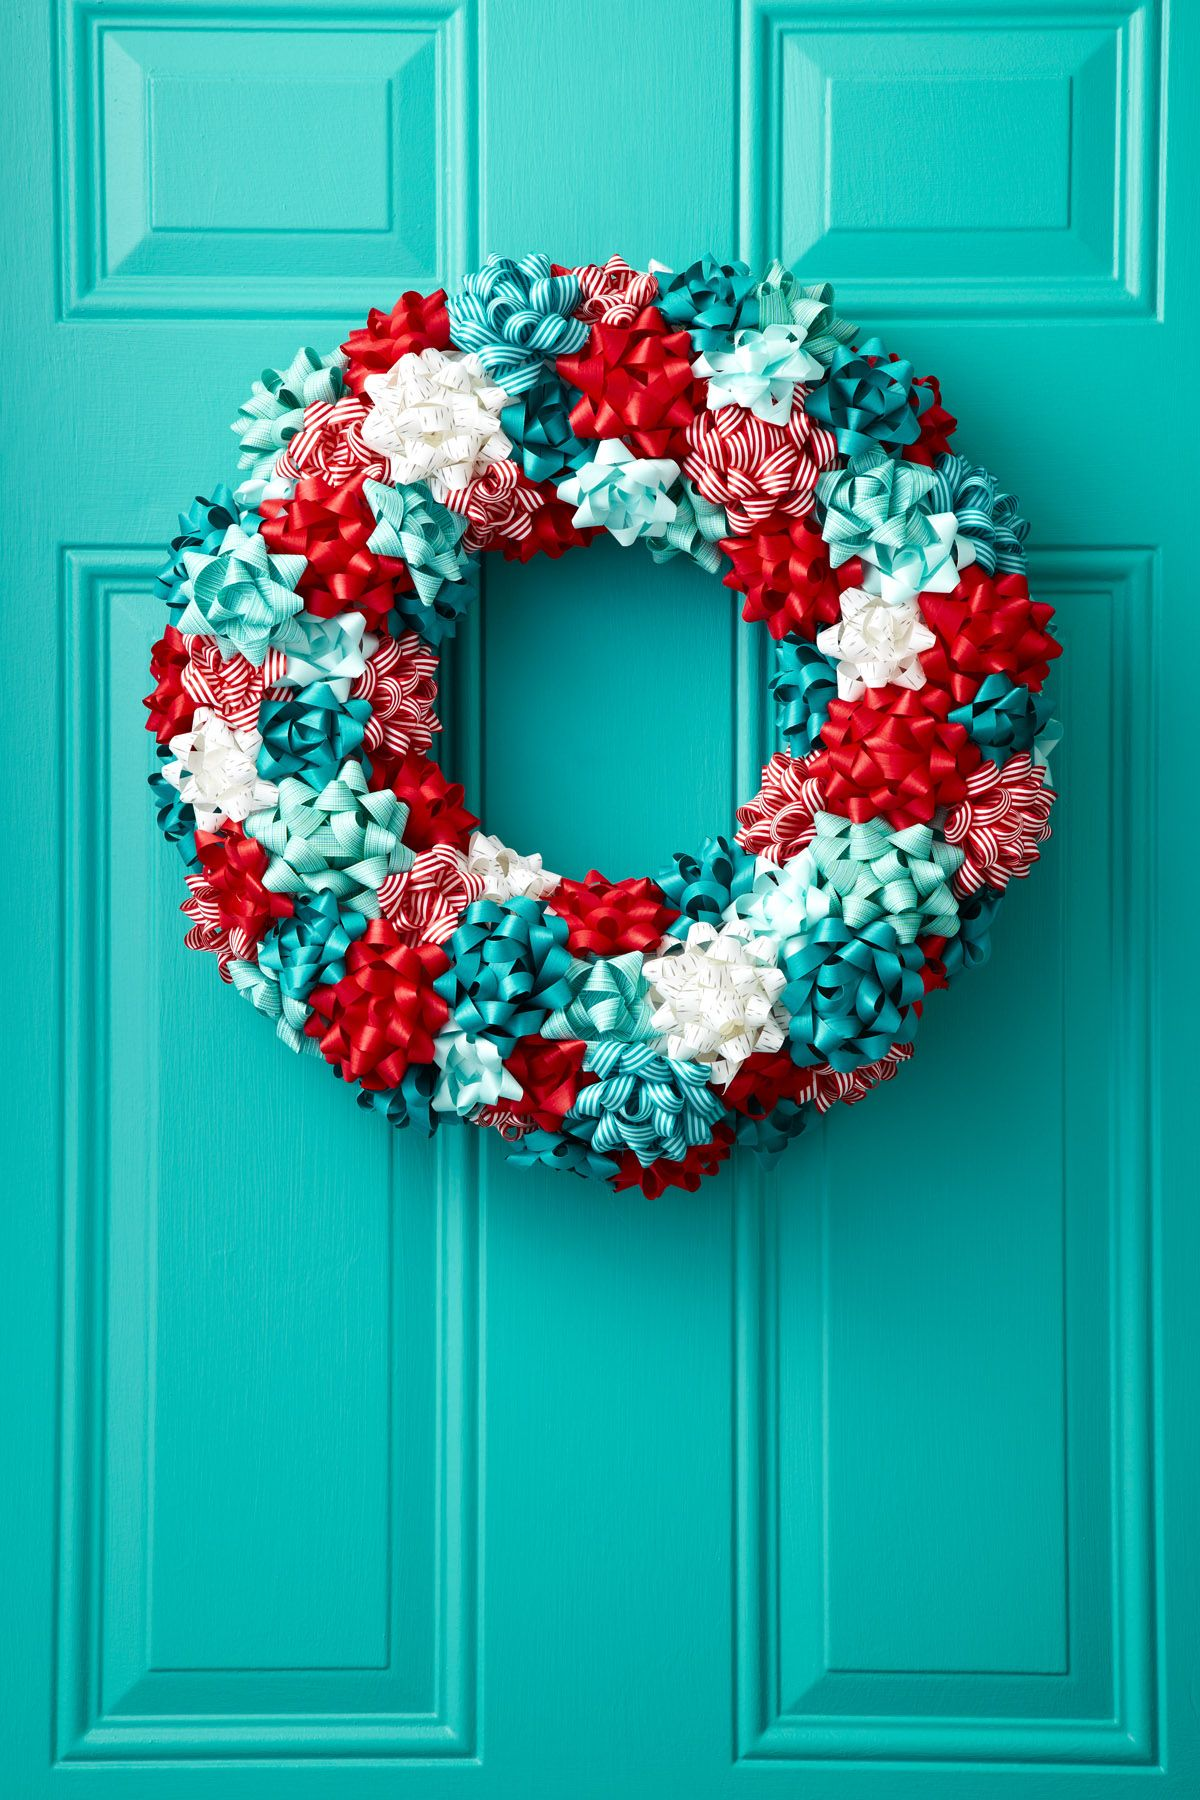 45 DIY Christmas Wreath Ideas - How To Make a Homemade Holiday ...